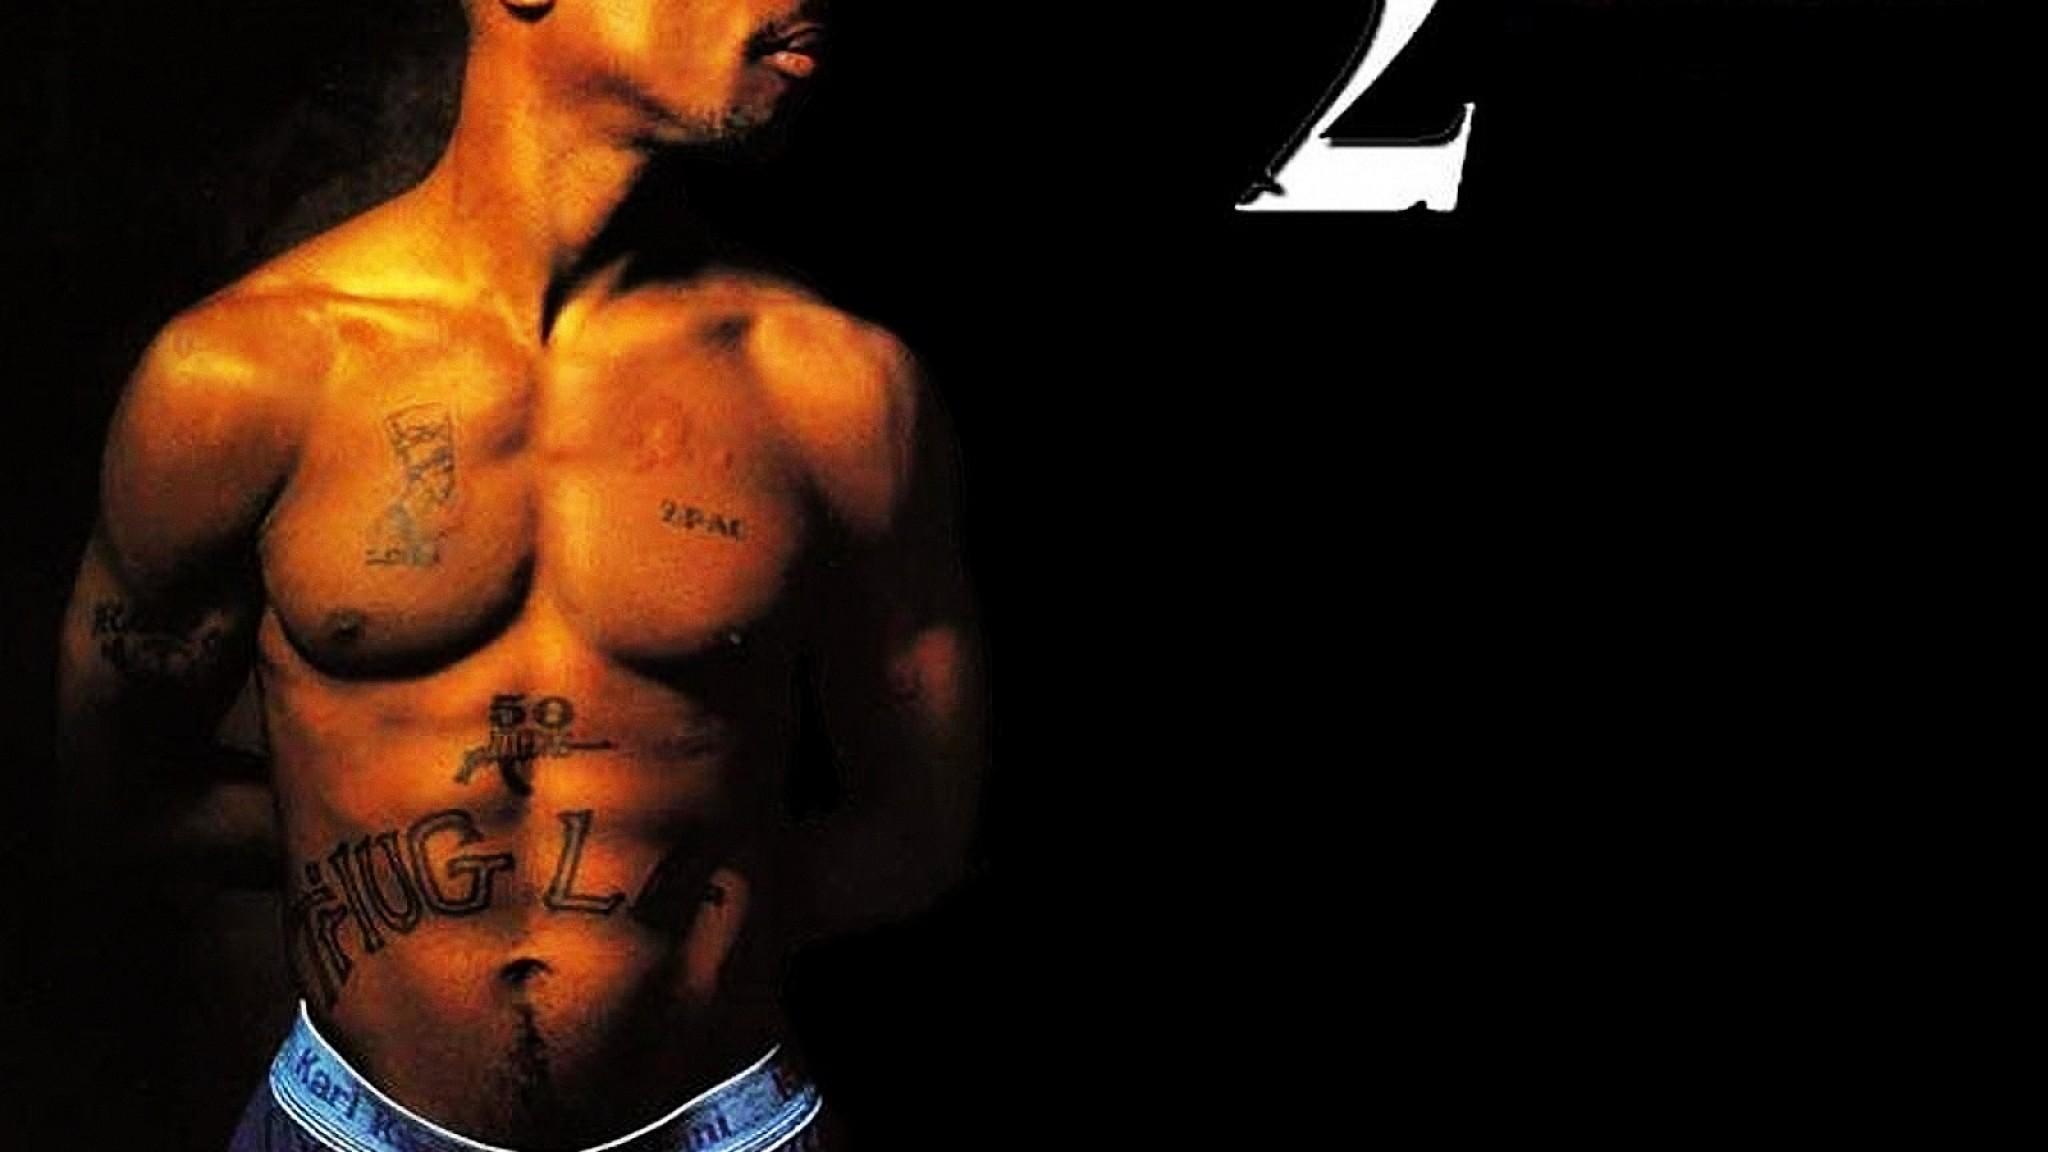 Download Tupac Wallpaper HD · thug life …